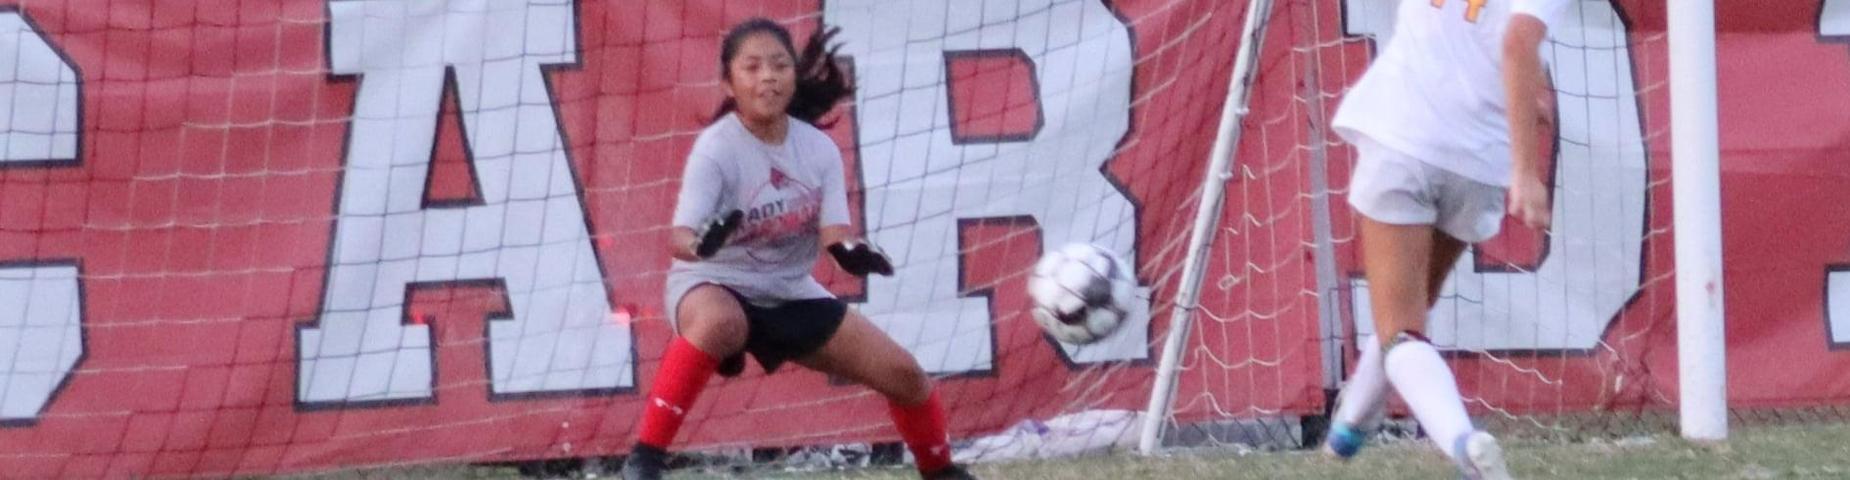 MHS Lady Cards Soccer